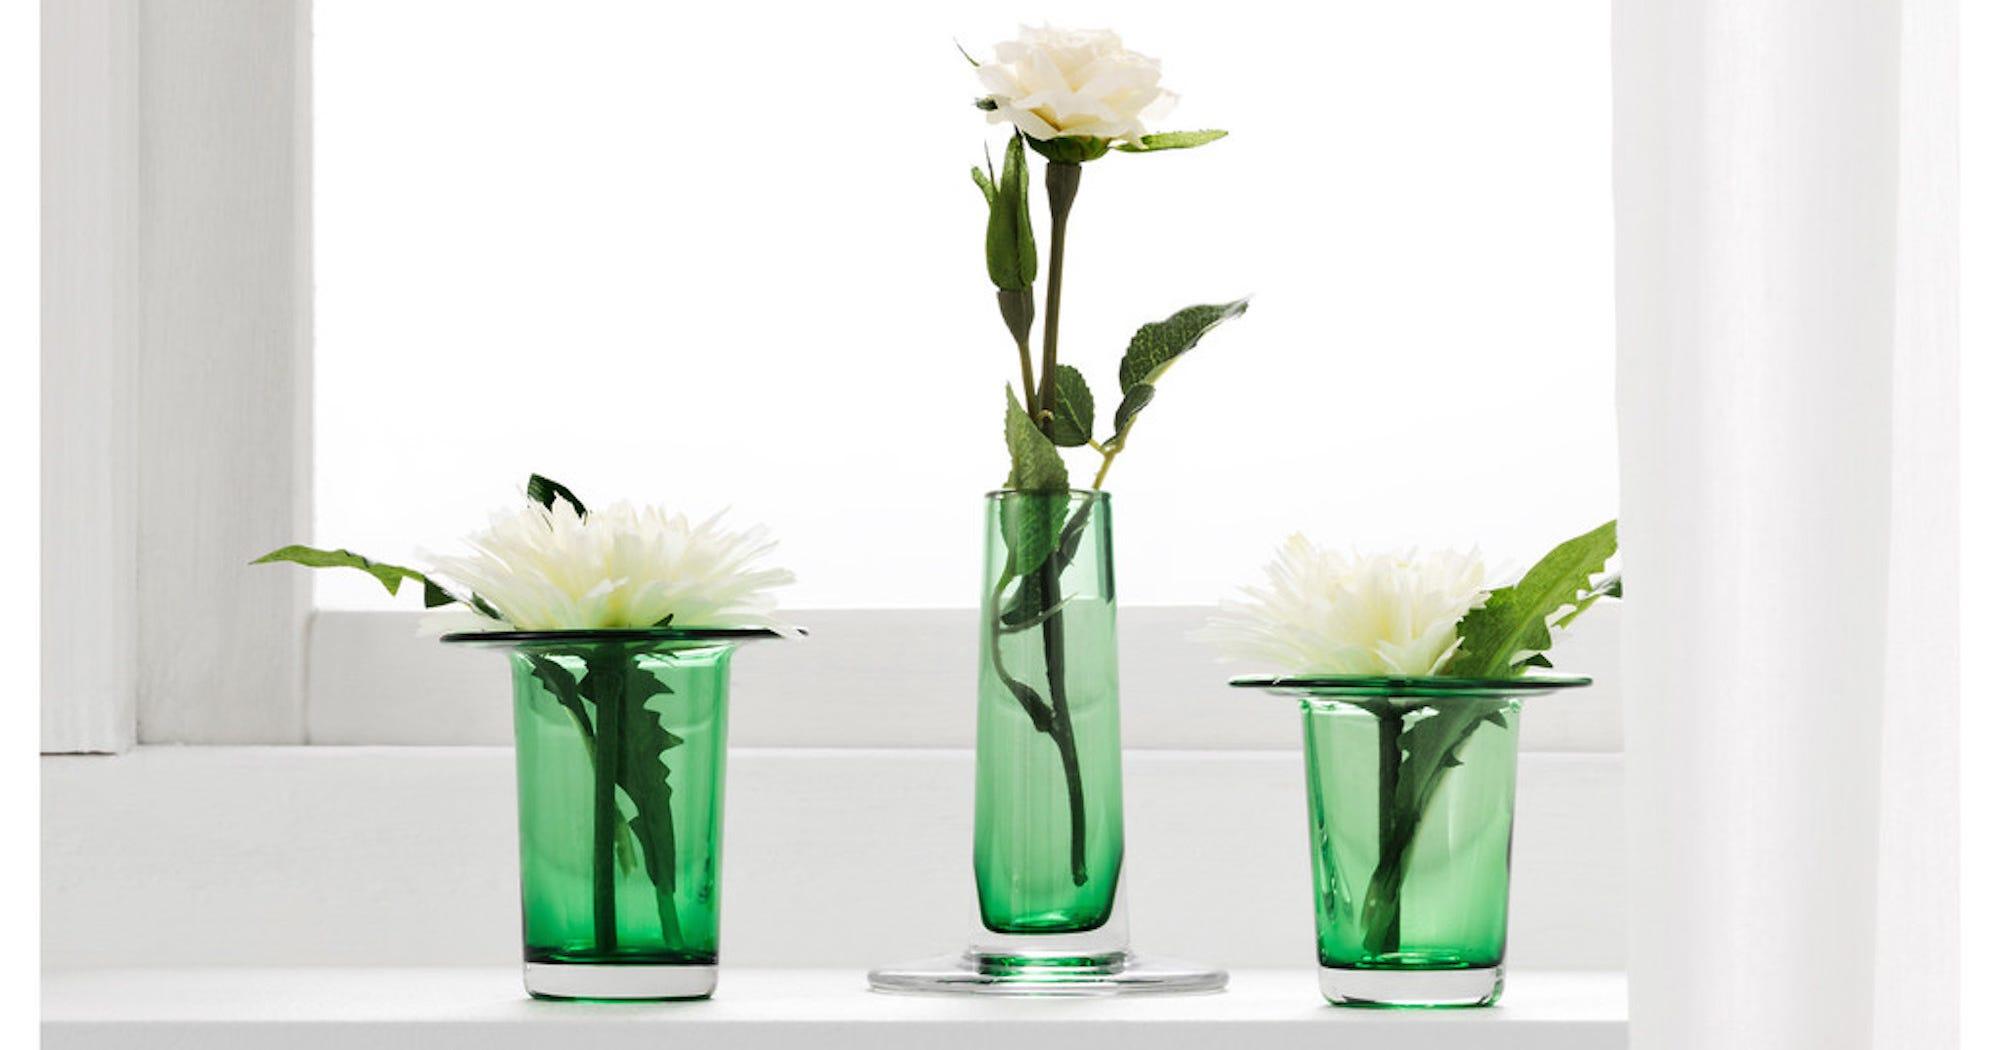 Vase Transparent Ikea Ikea Smycka Artificial Flower The